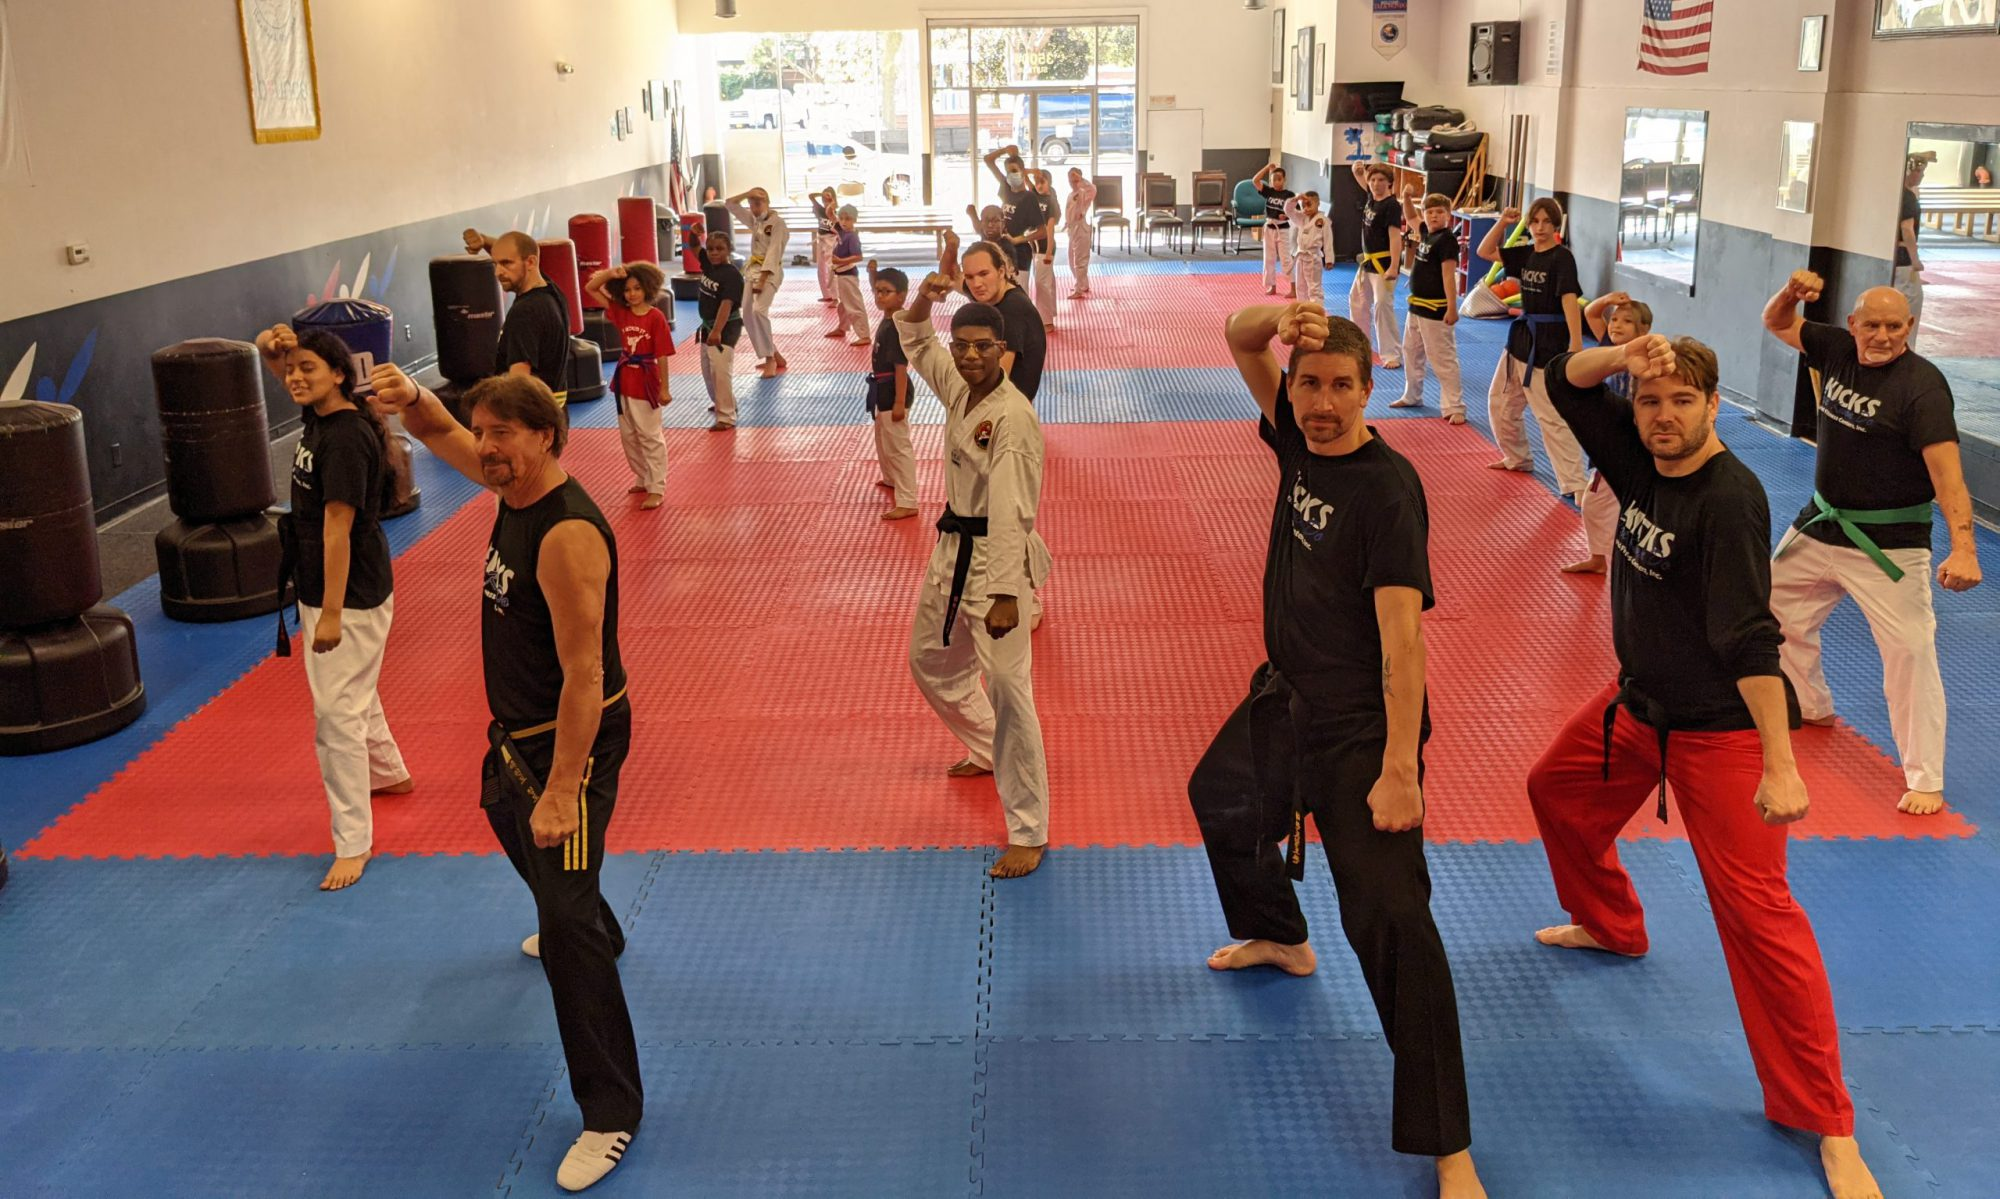 Kicks Taekwondo and Fitness Centers